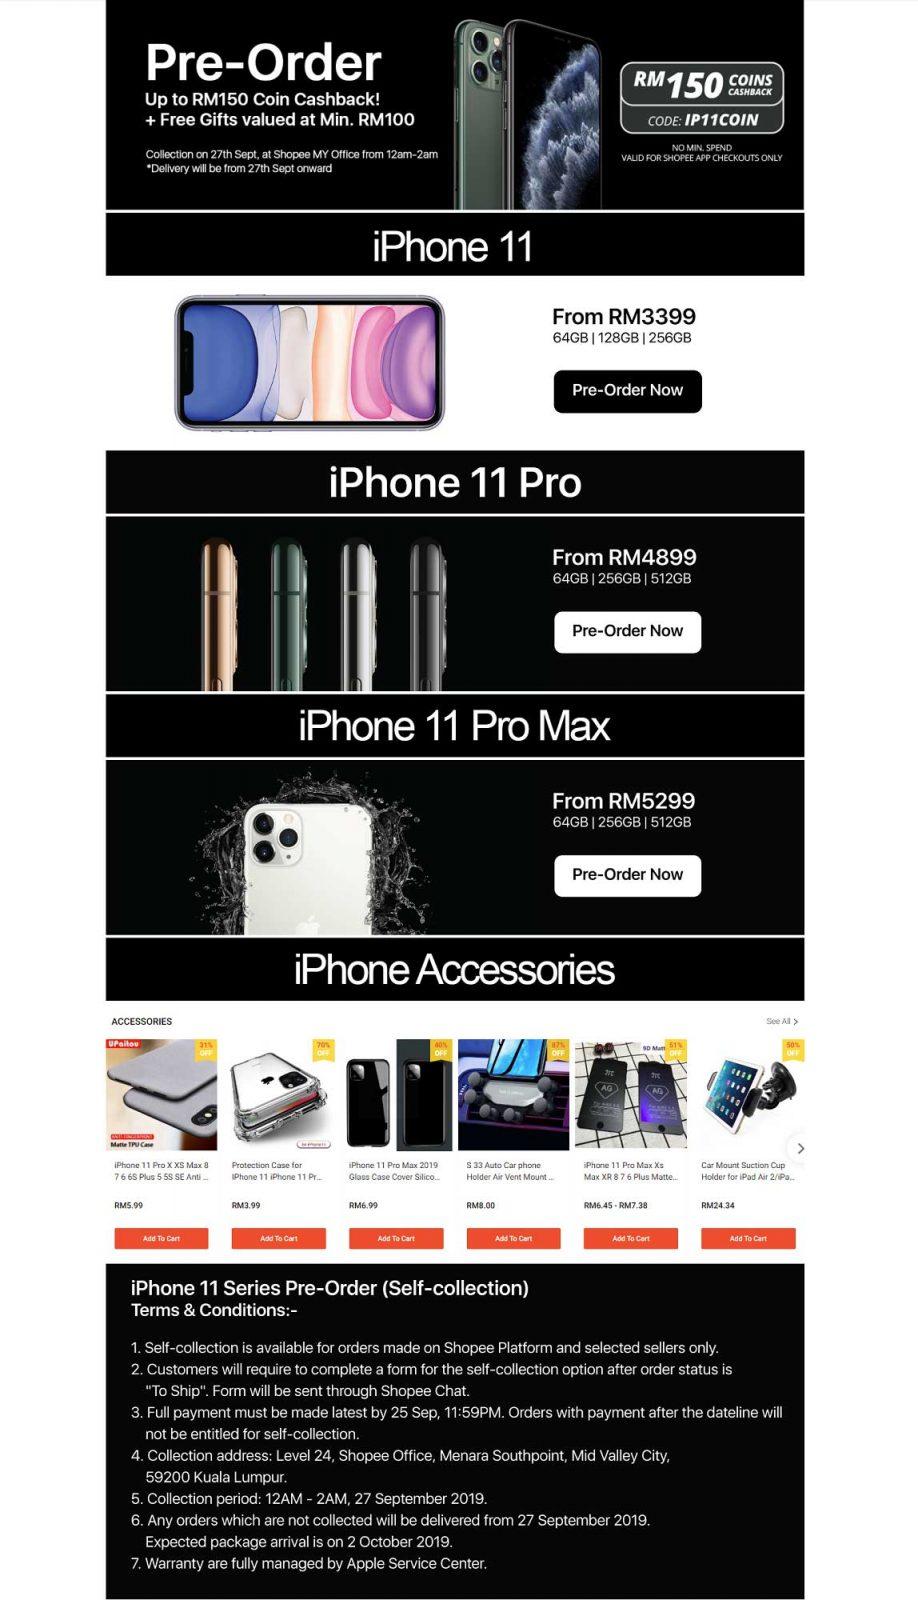 shopee pre-order iphone 11